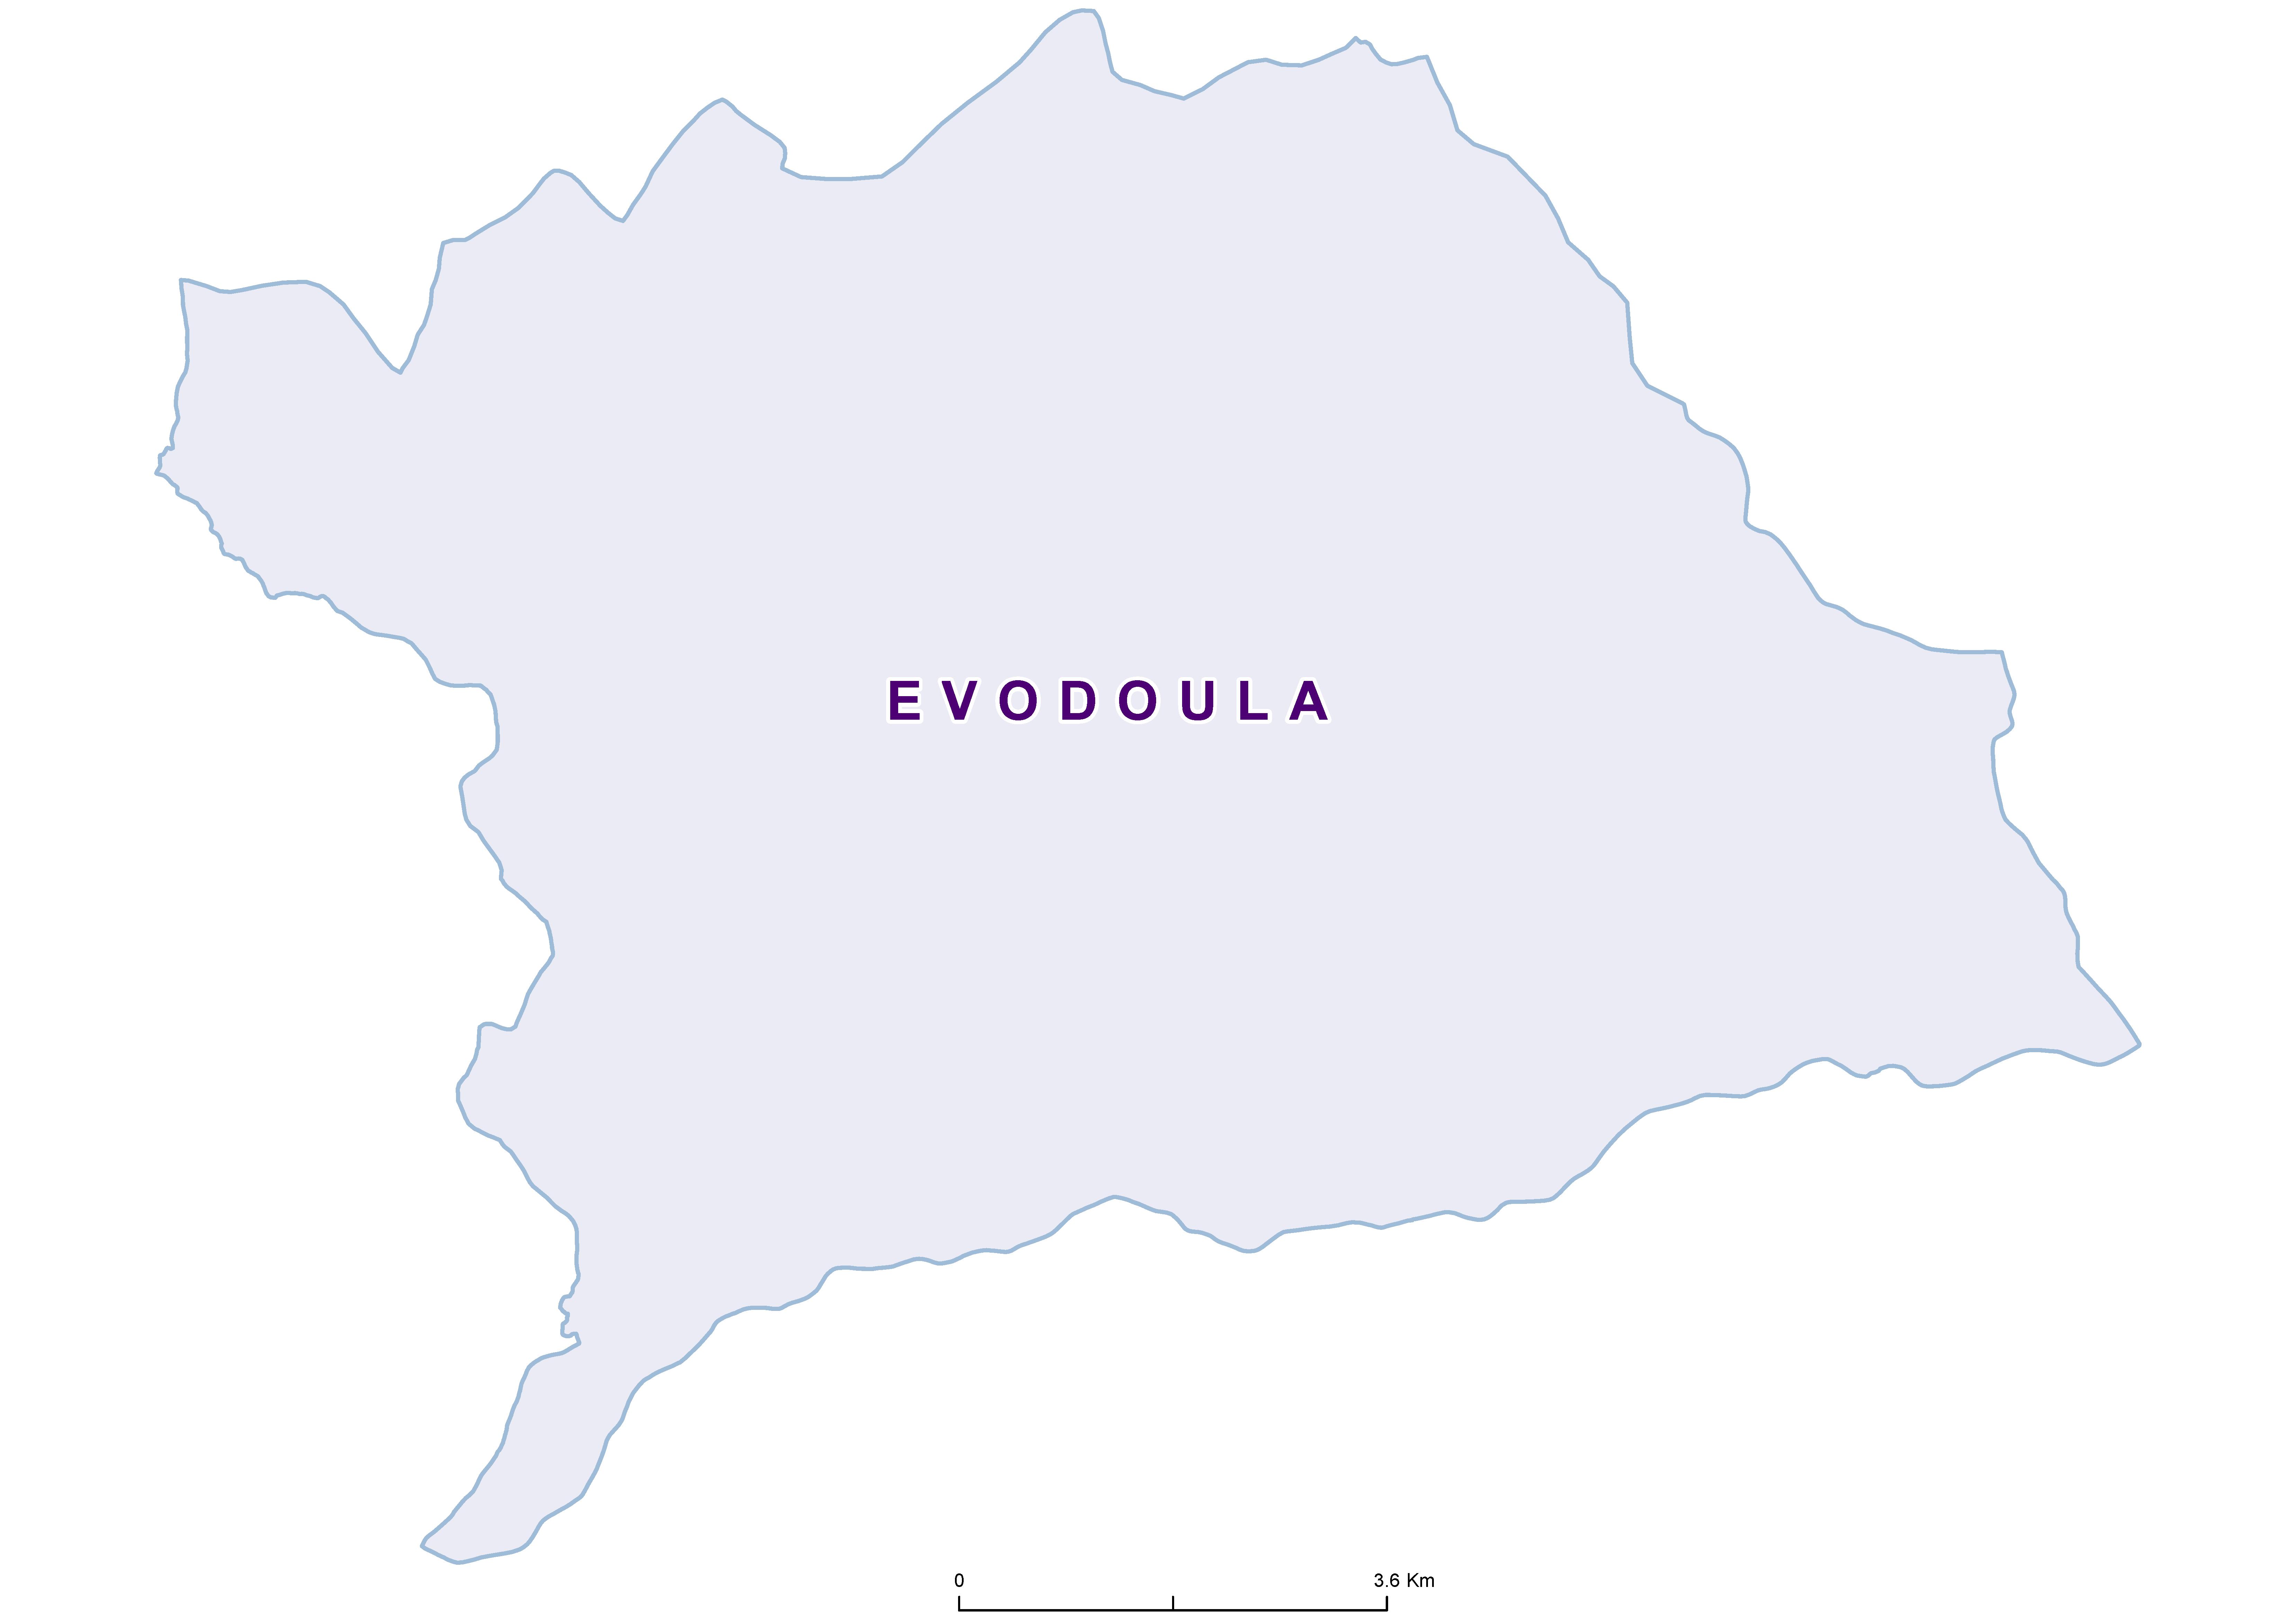 Evodoula Max STH 20180001